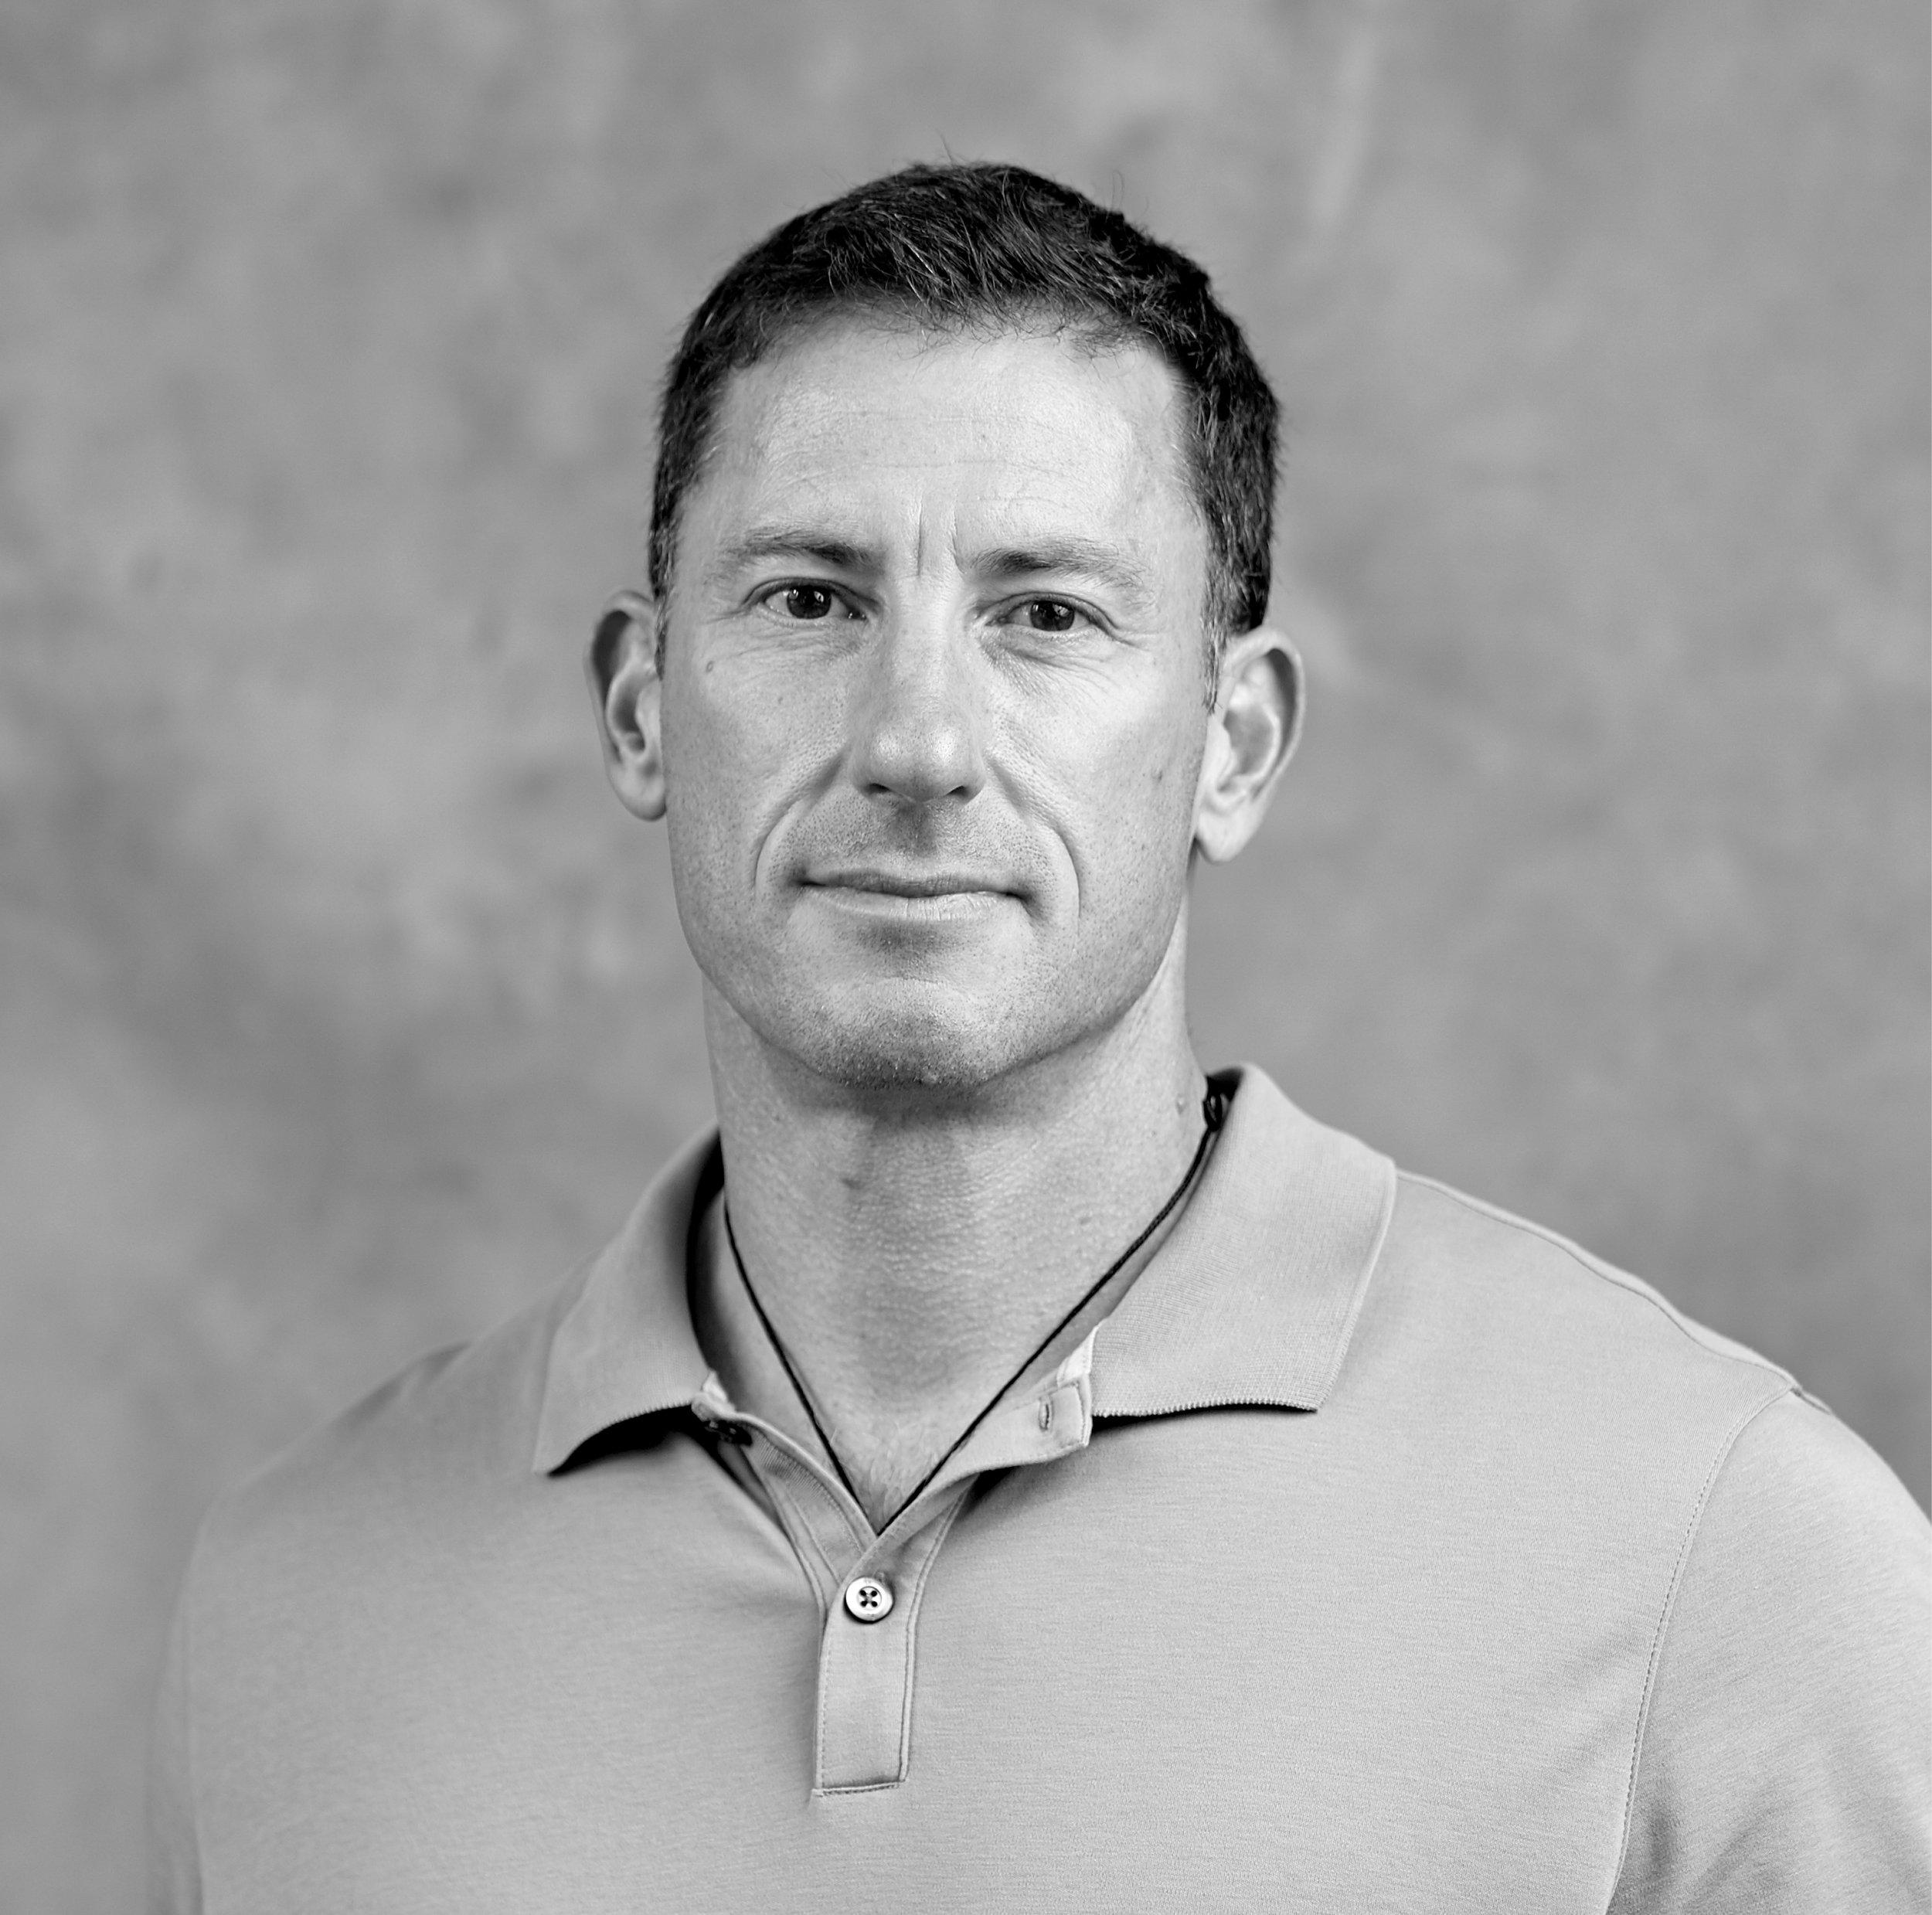 Dr Matt Kritz, developer of the Kritz Movement System